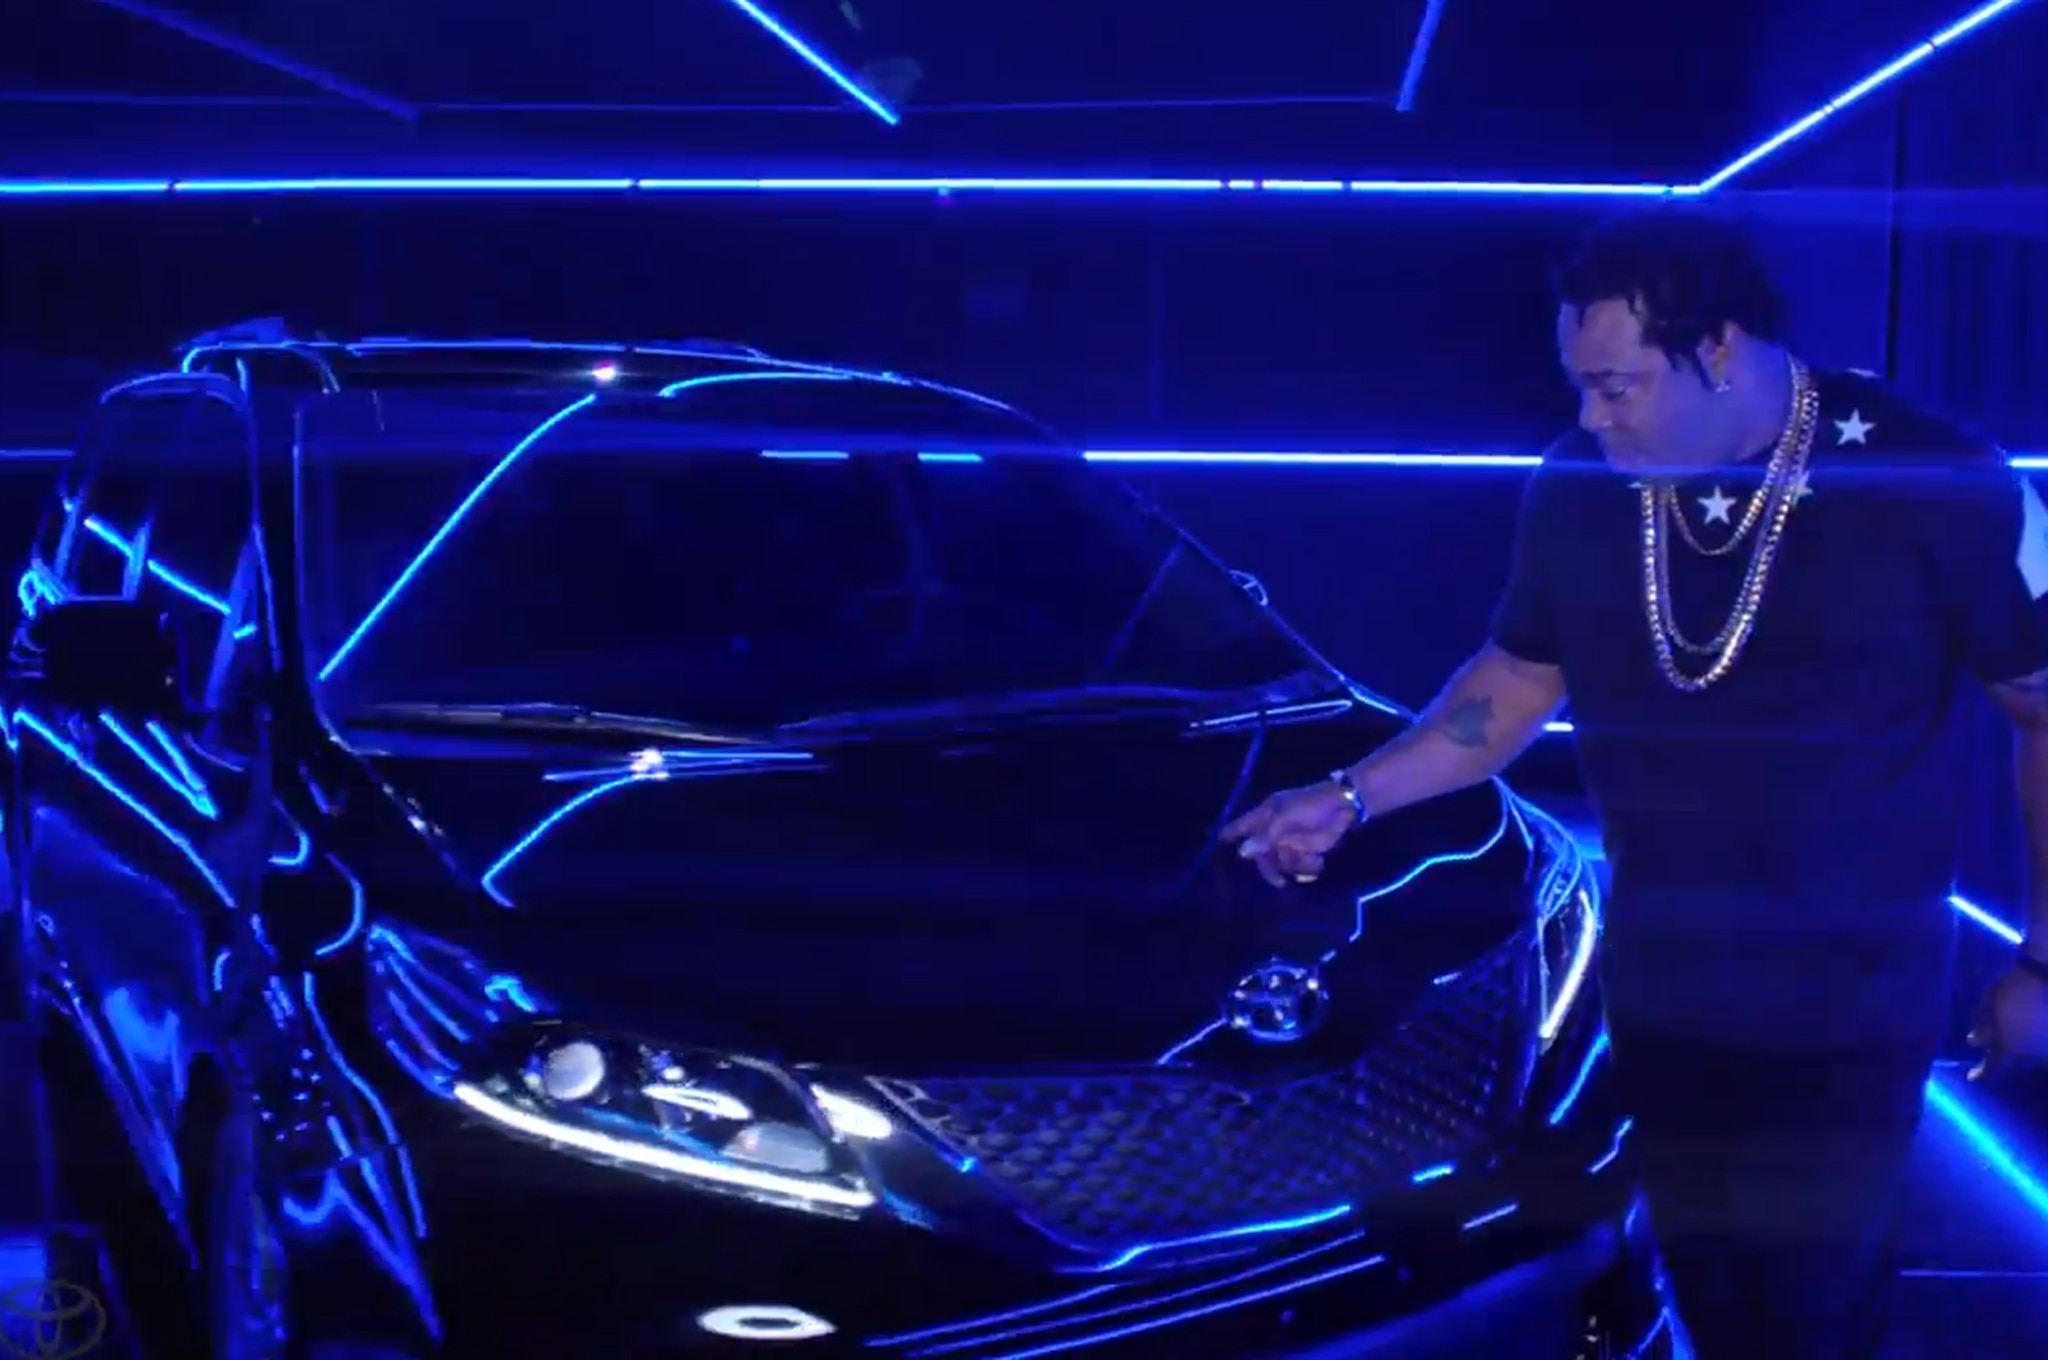 2015 Toyota Sienna Swagger Wagon Video Busta Rhymes1